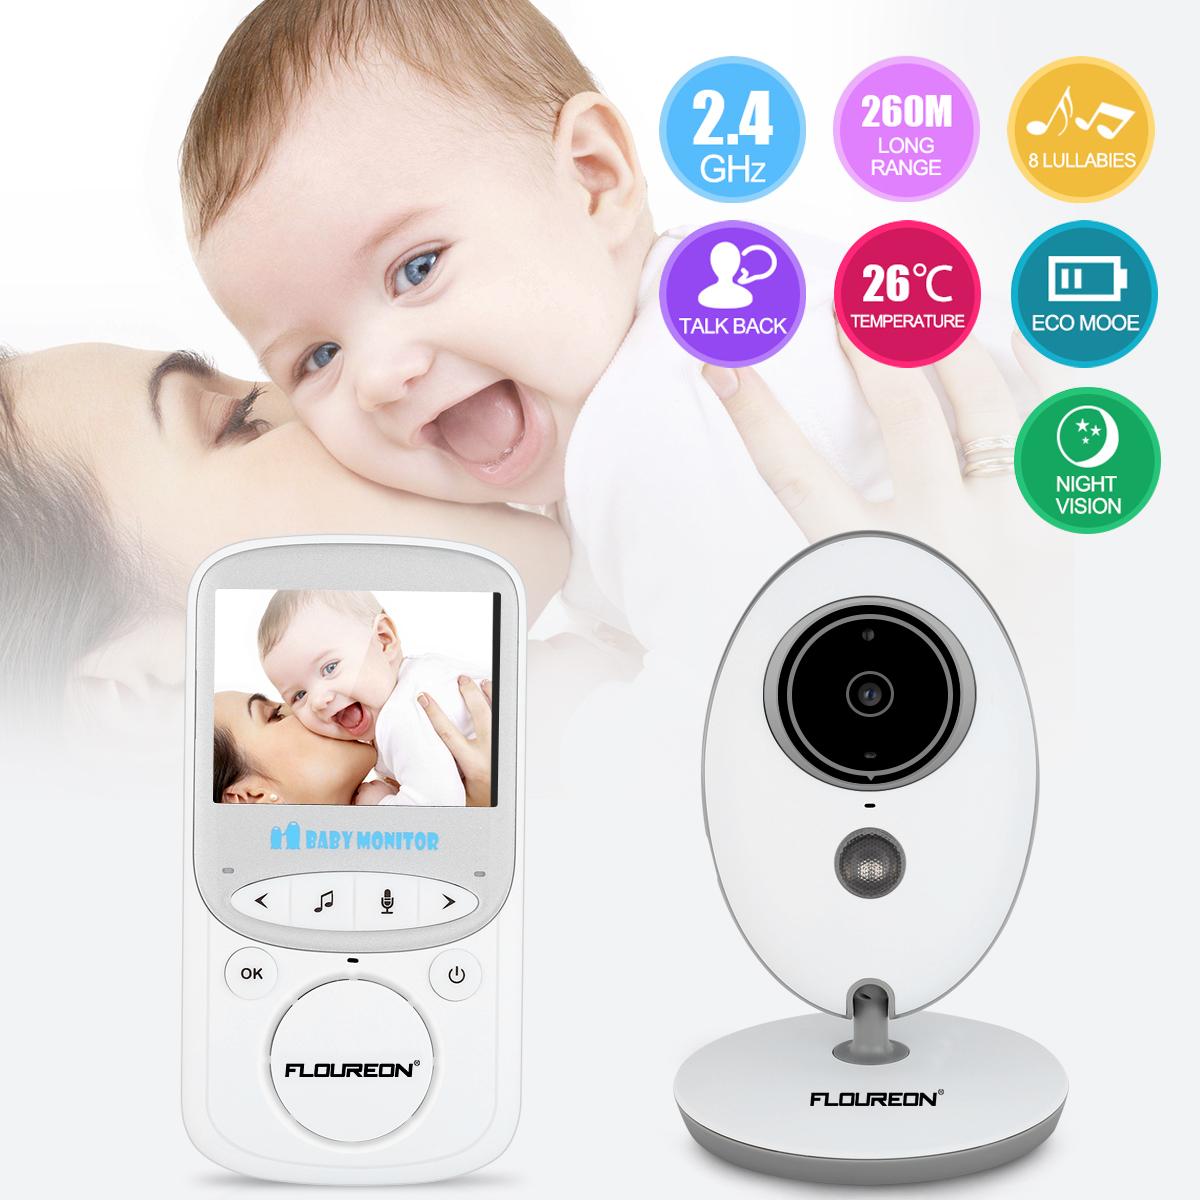 "Video Baby Monitor with LCD Display, FLOUREON Wireless Digital Camera, 2.4"" Infrared Night Vision, Two Way Talk Back, Temperature Monitoring, Lullabies, Long Range and High Capacity Battery"